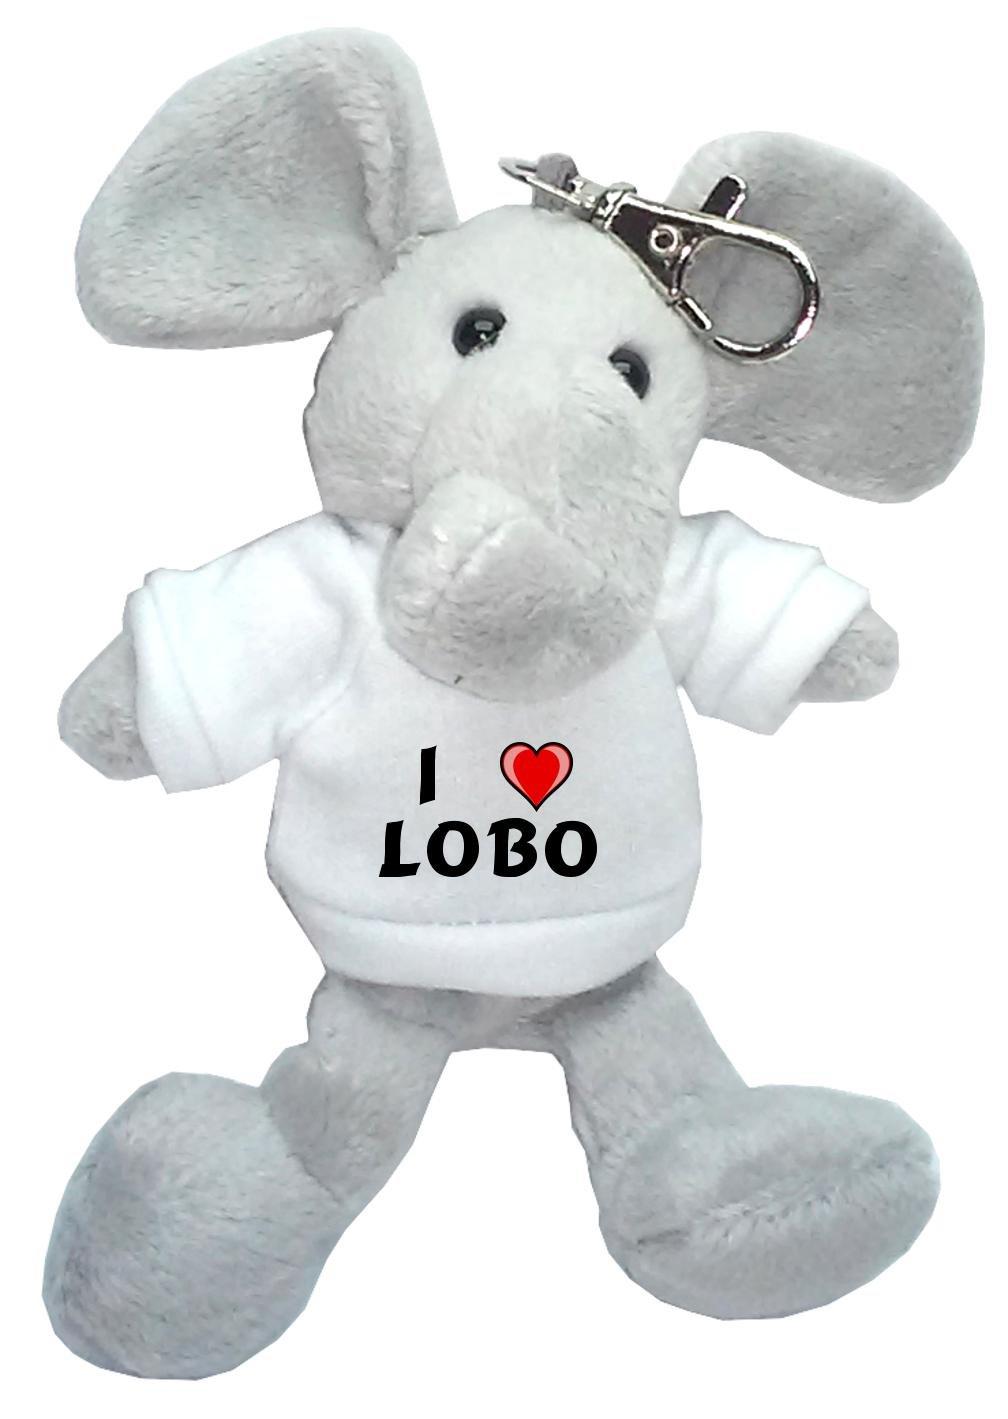 Amazon.com: Peluche de elefante llavero con I Love lobo ...